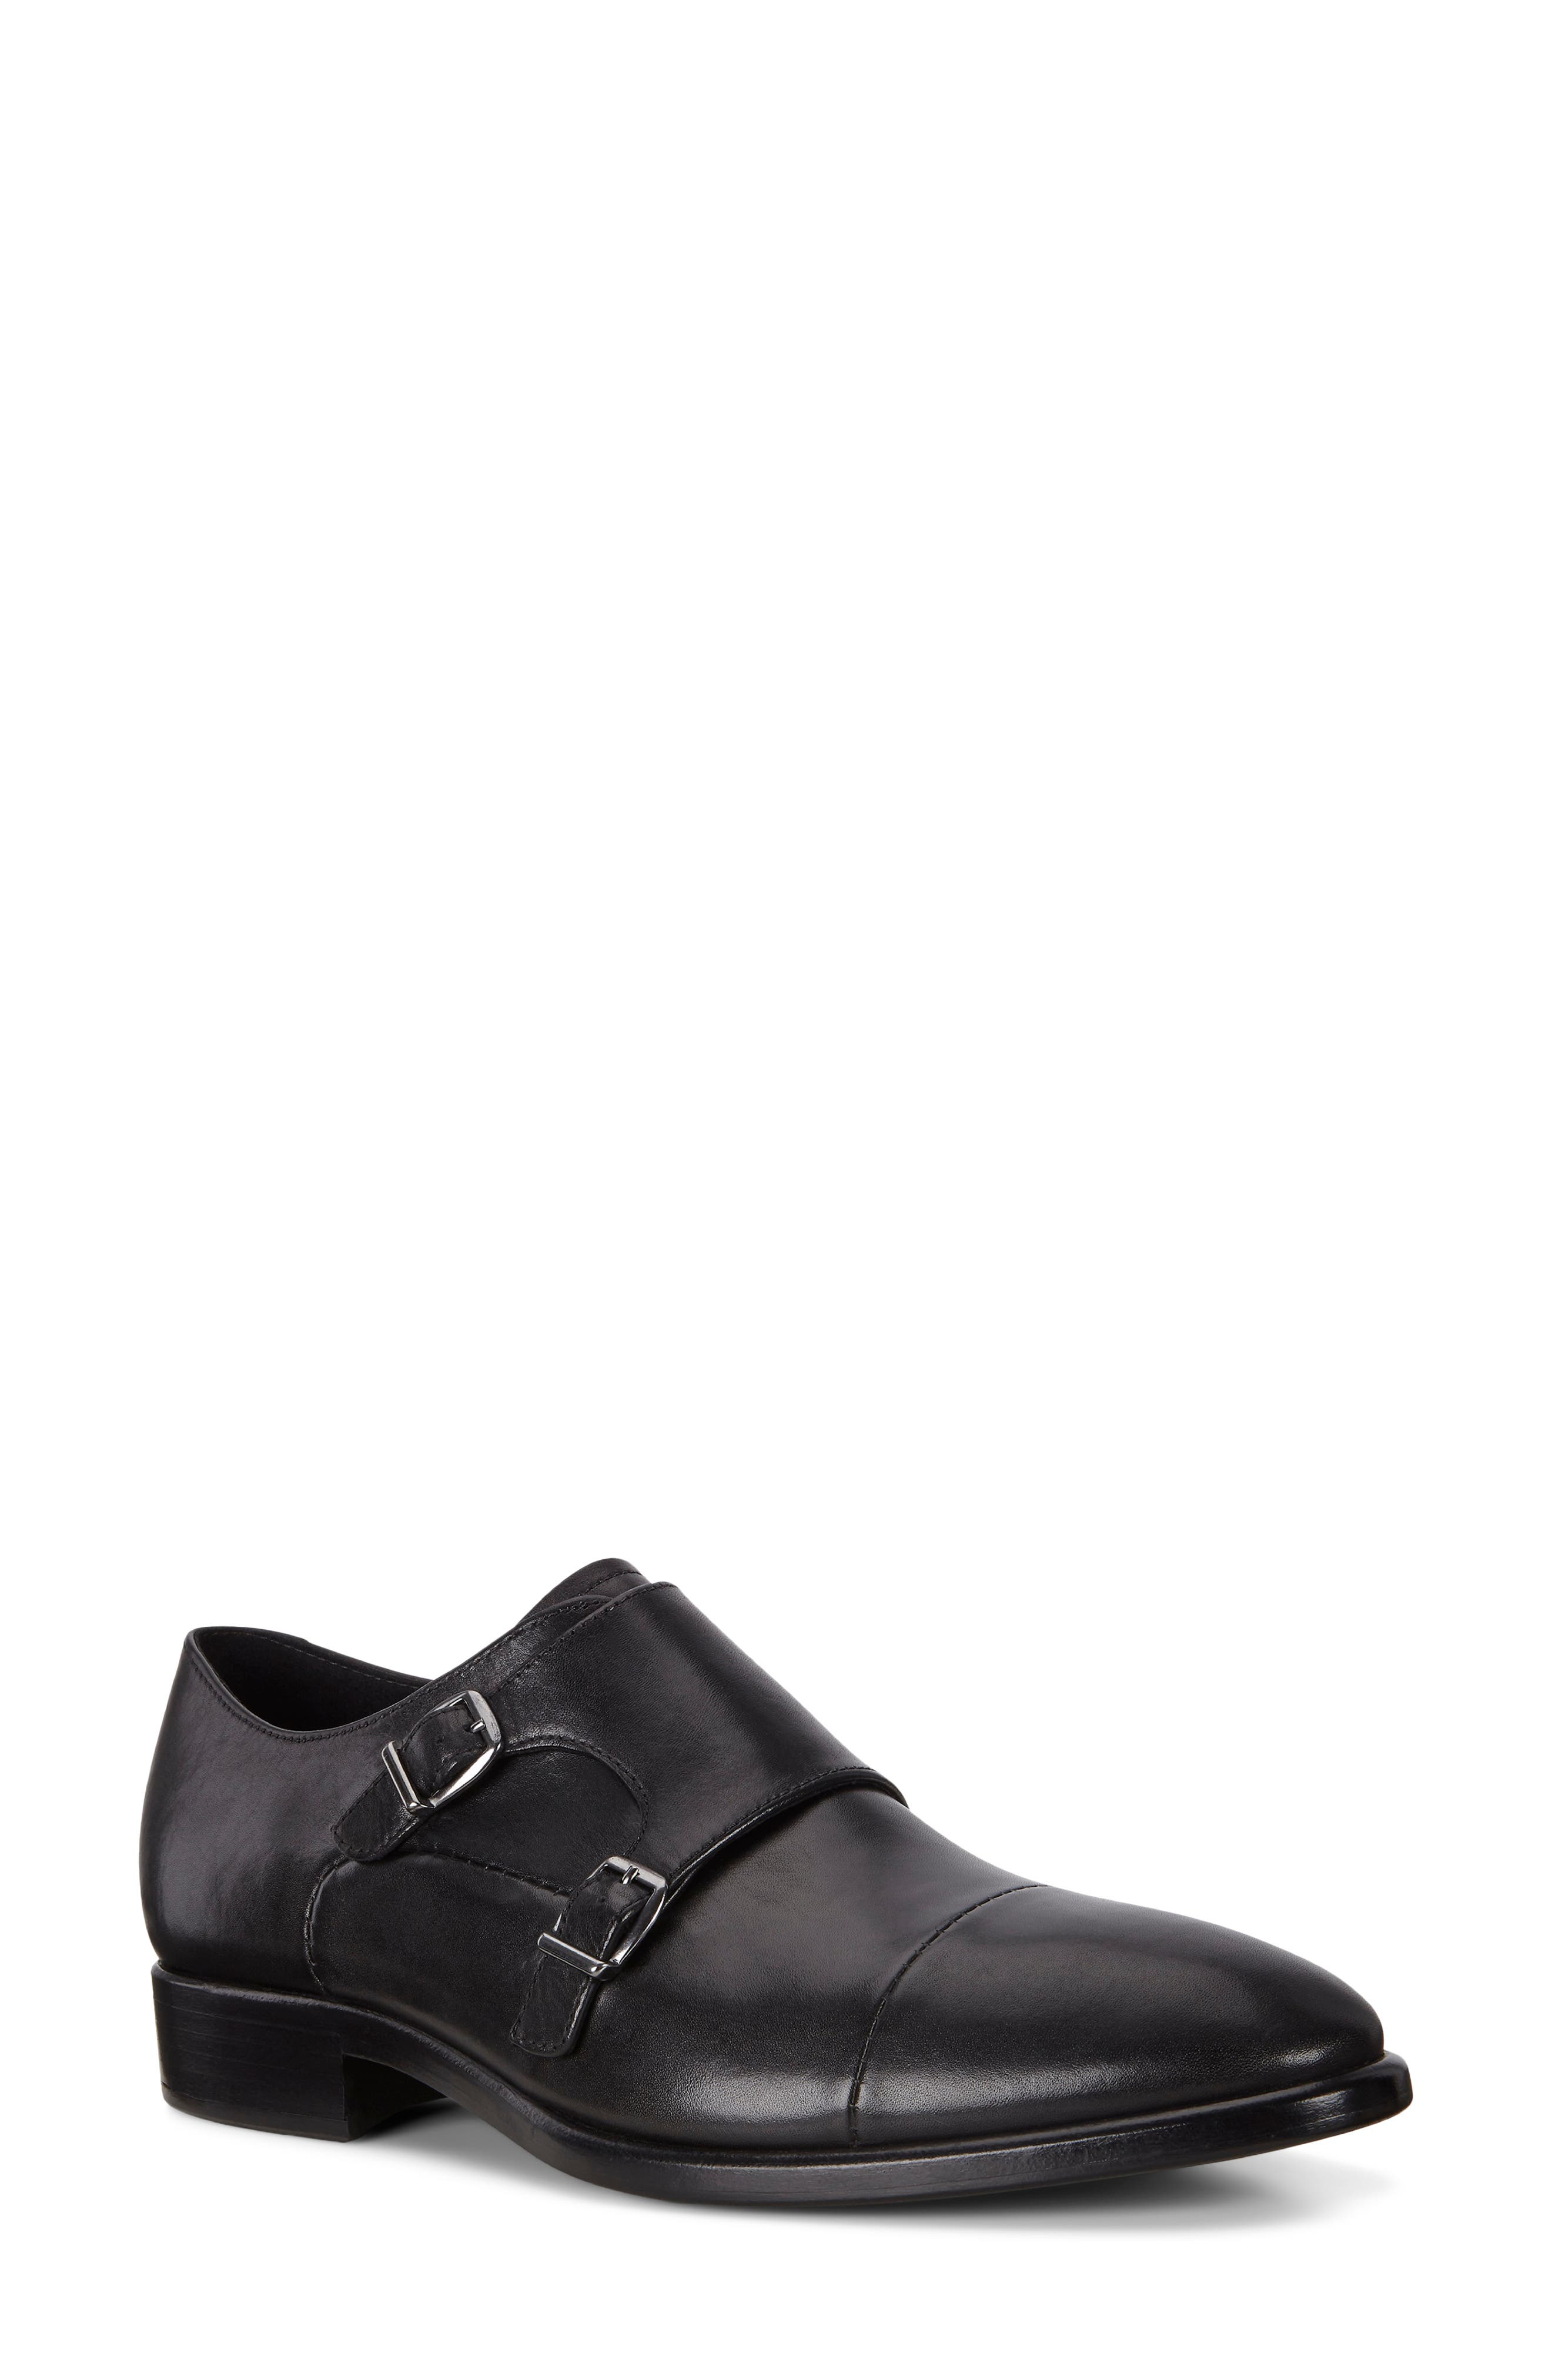 Men's Ecco Vitrus Mondial Double Monk Strap Shoe